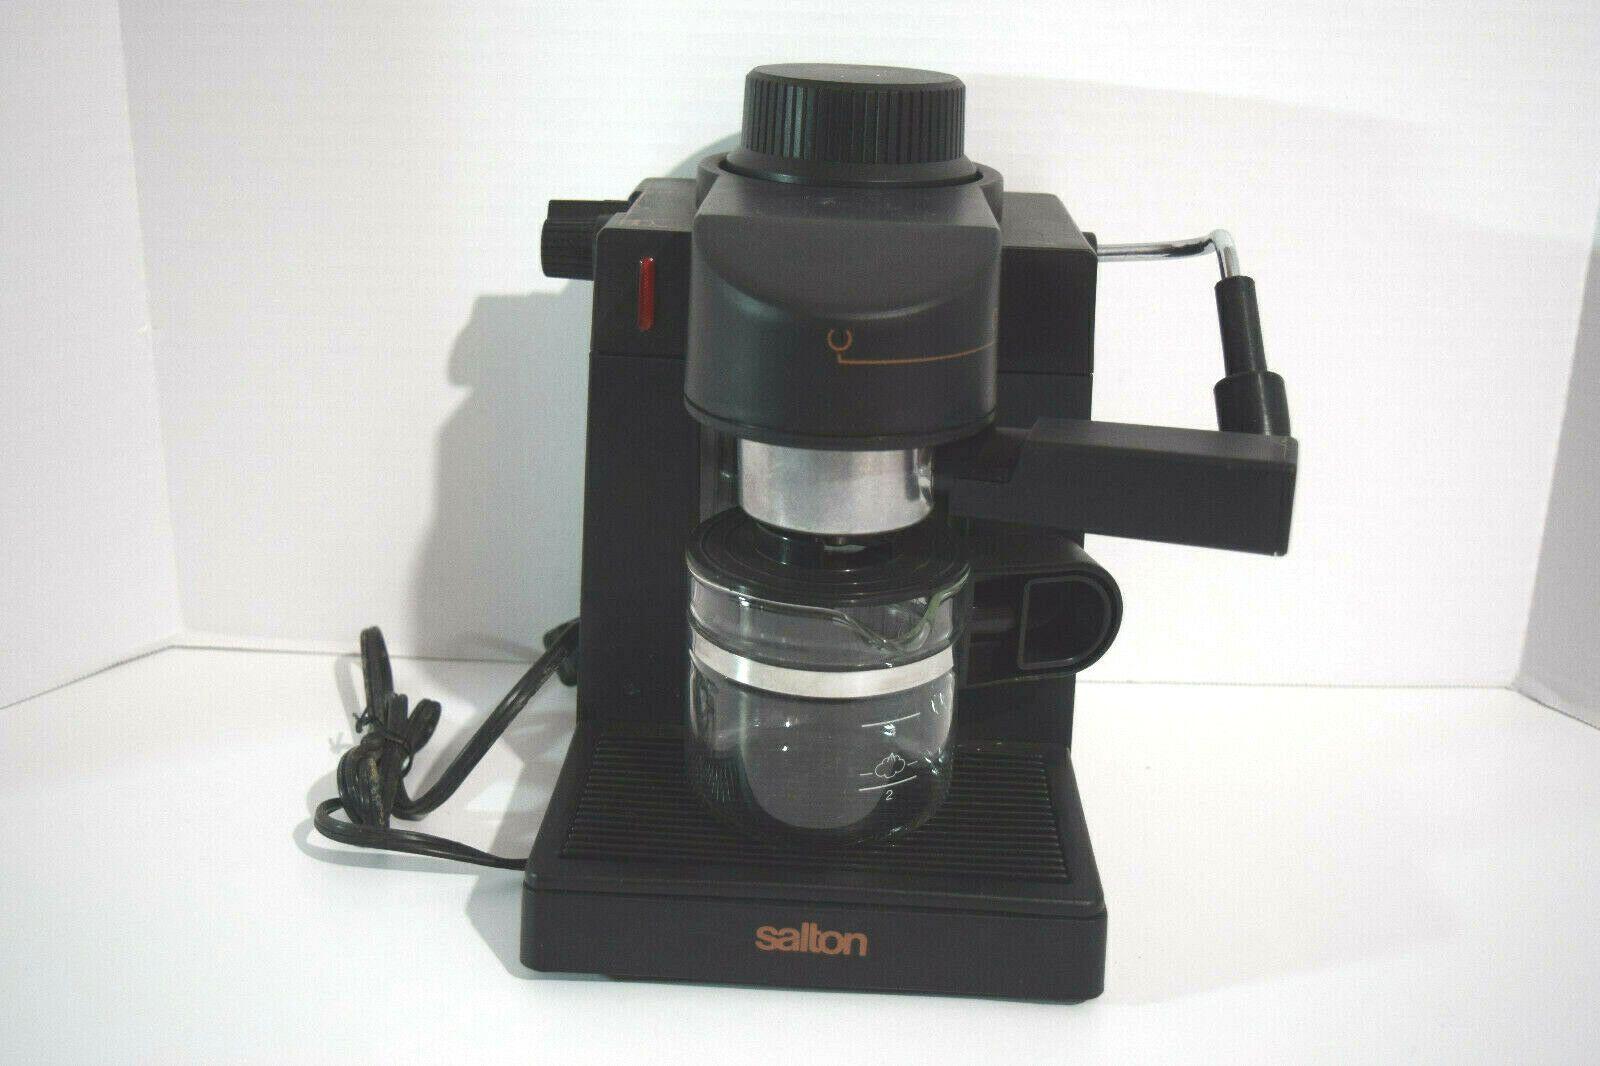 Single Serve Coffee Maker Small KCup Brew Pod Brewer